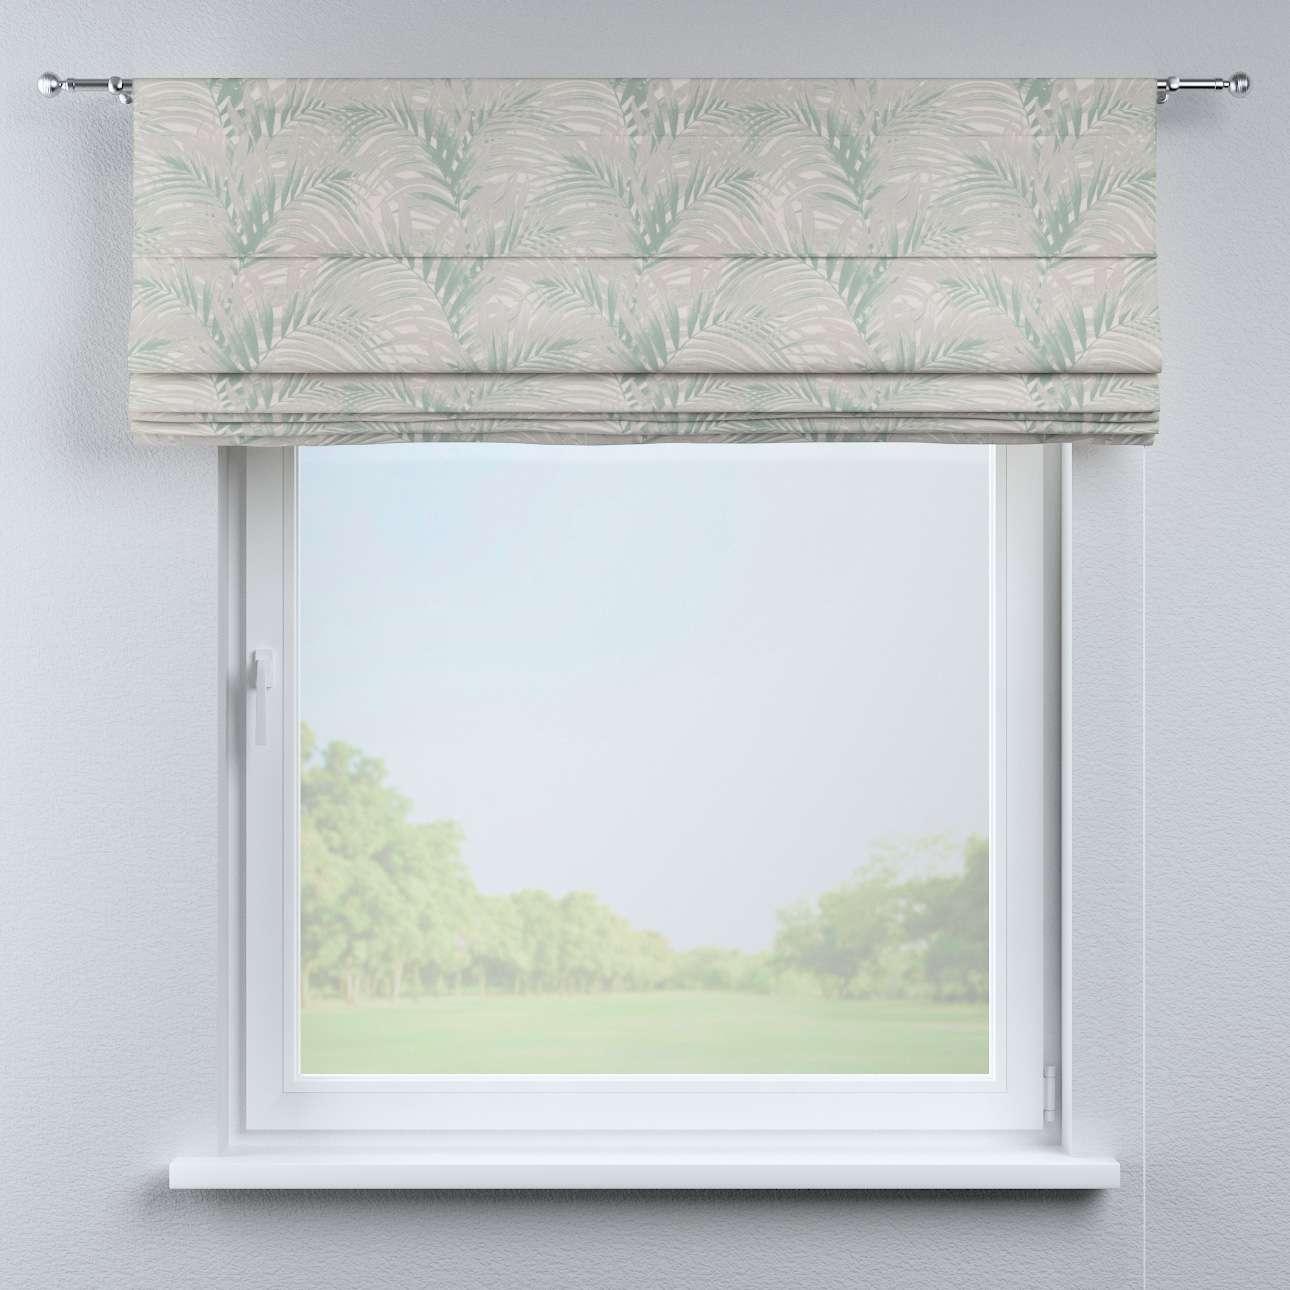 Rímska roleta Torino V kolekcii Gardenia, tkanina: 142-15